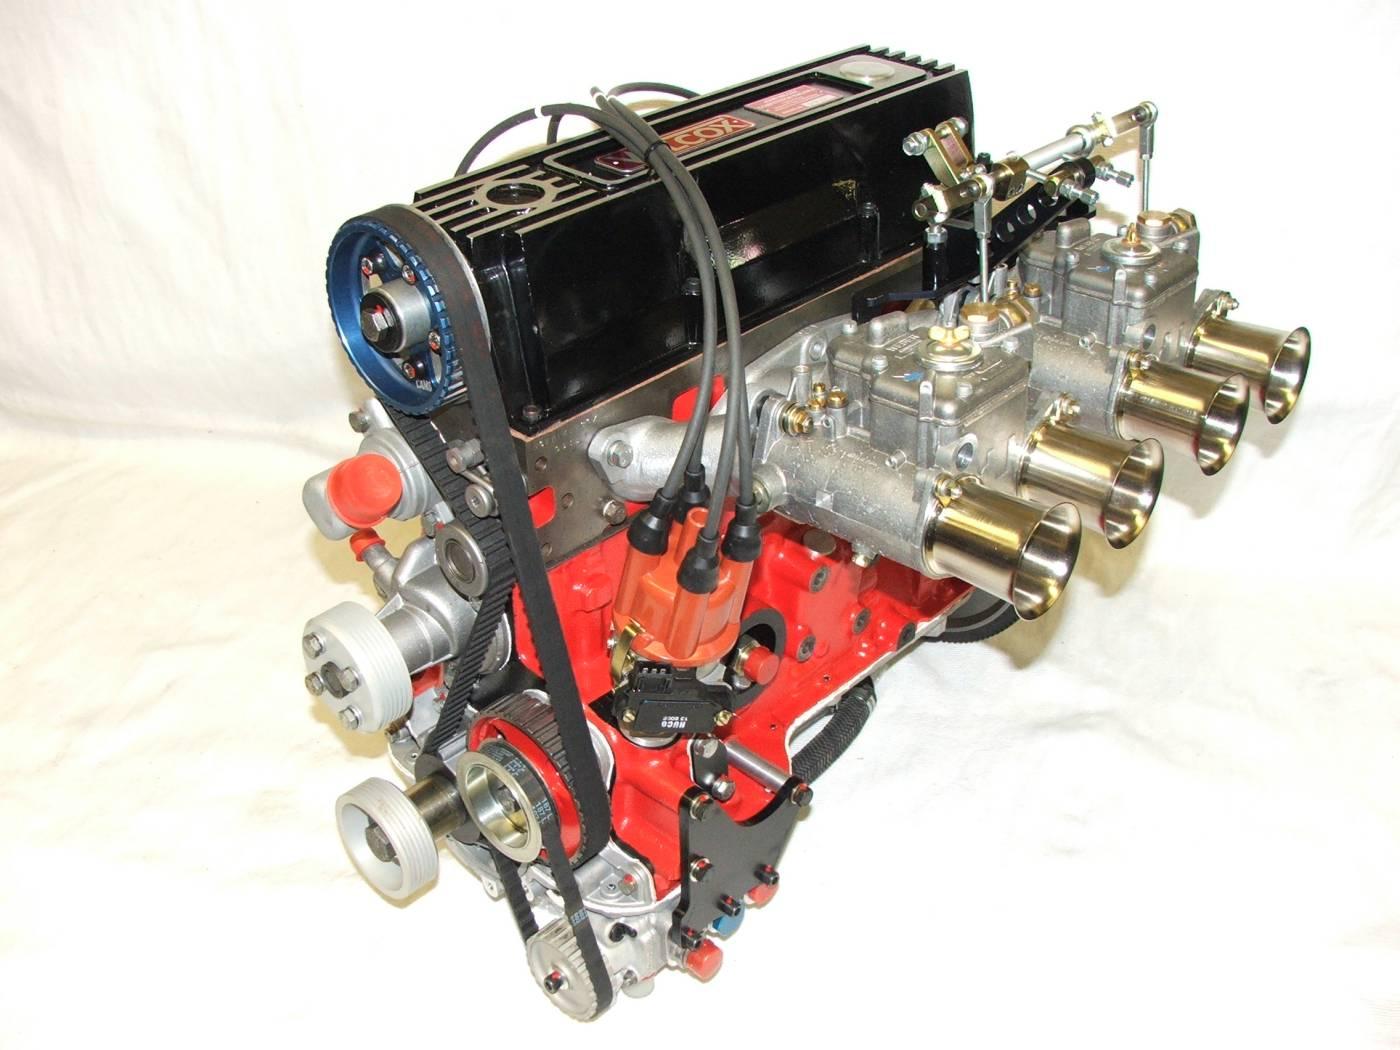 Ford pinto engine 2001 Toyota V6 Engine Diagram Chrysler 2.5 V6 Engine Diagram Diagram for 2002 Mitsubishi Montero Motor